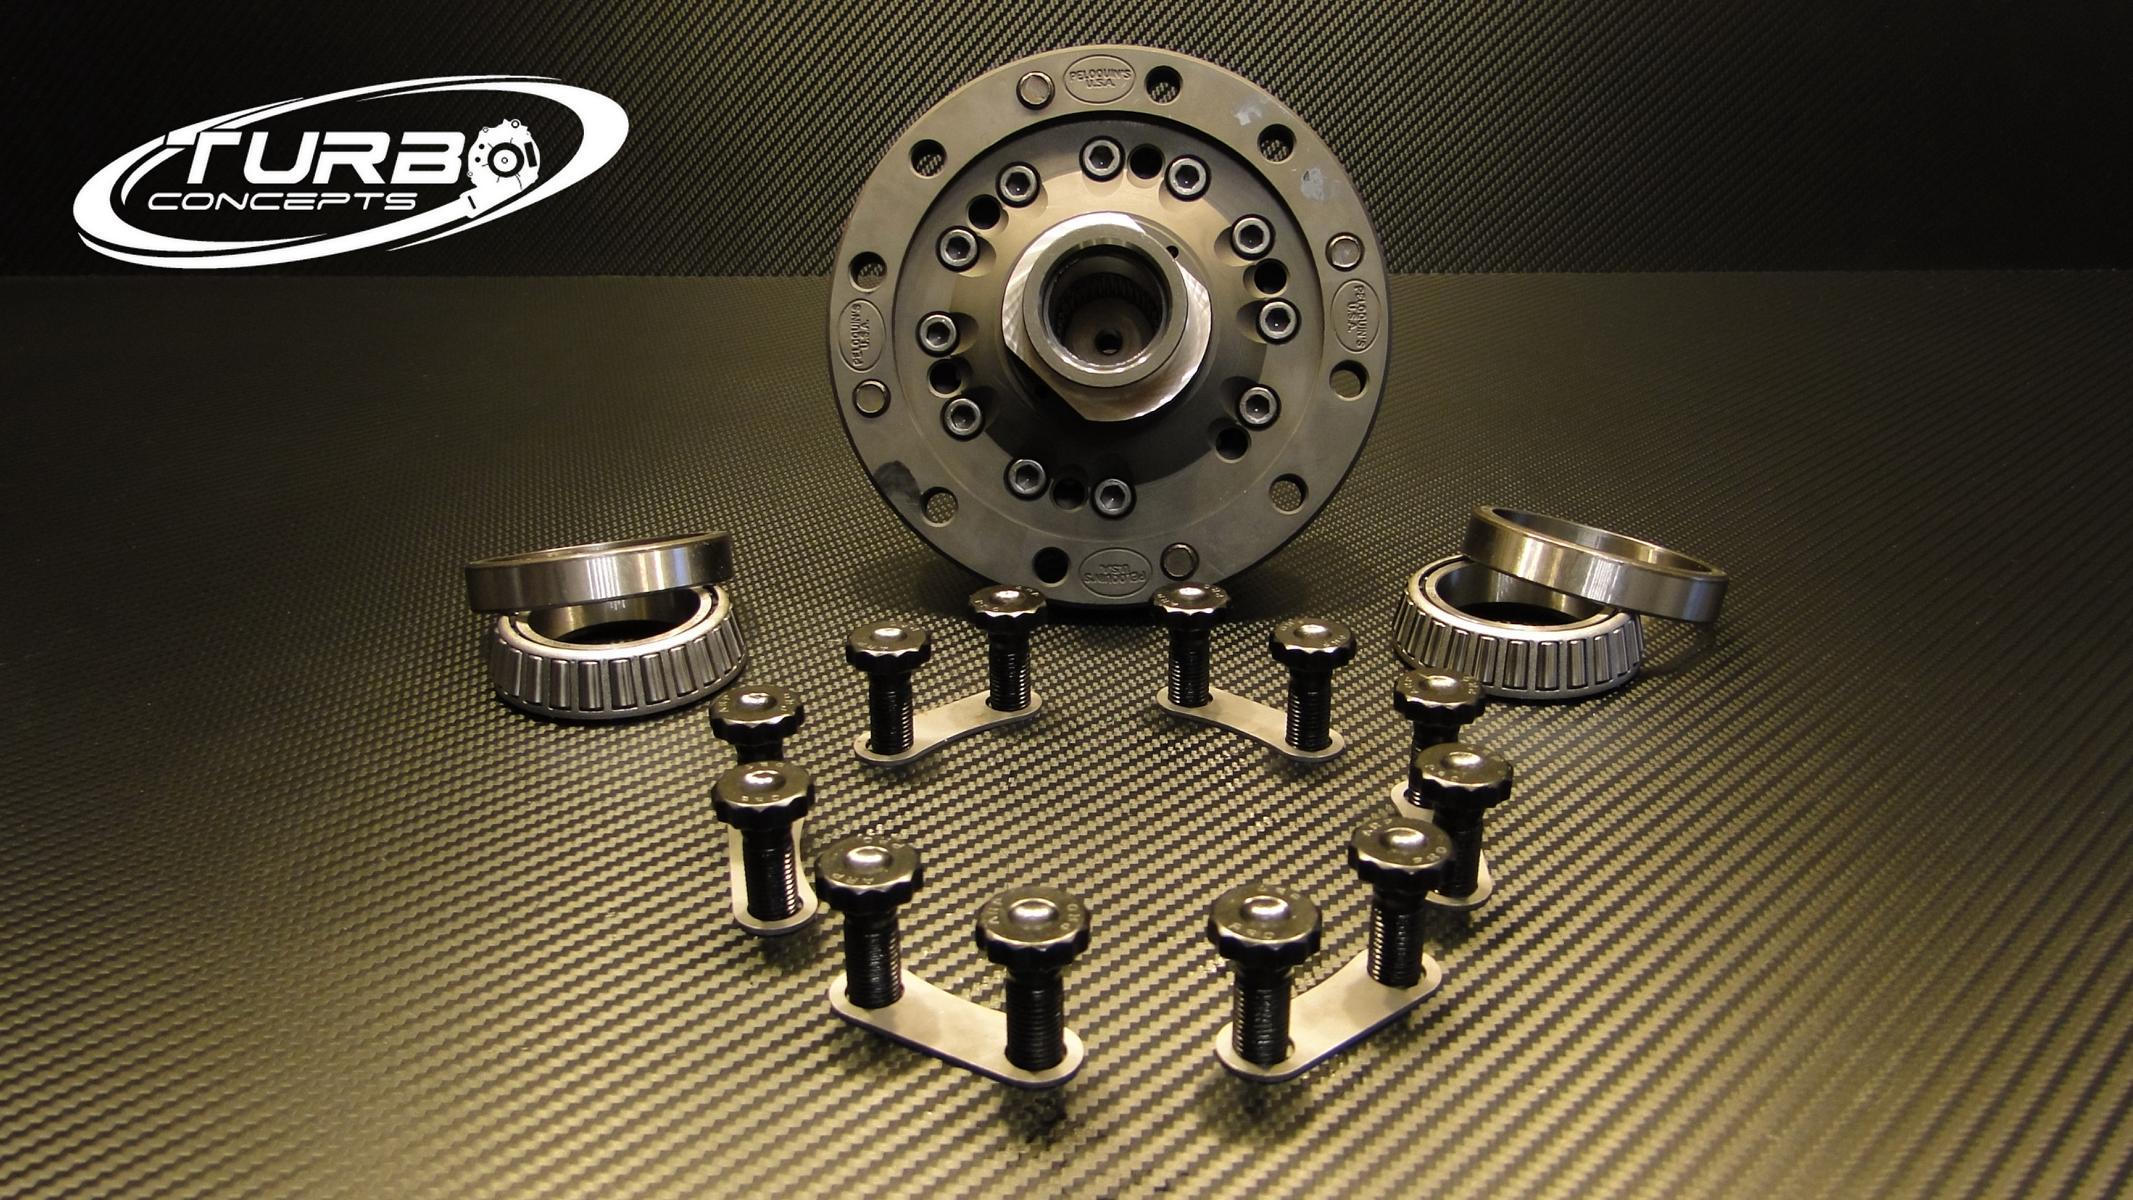 Peloquin Differentialsperre für 02Q 6-Gang Allrad Getriebe 2 0T S3 / TT /  R32 Mk5